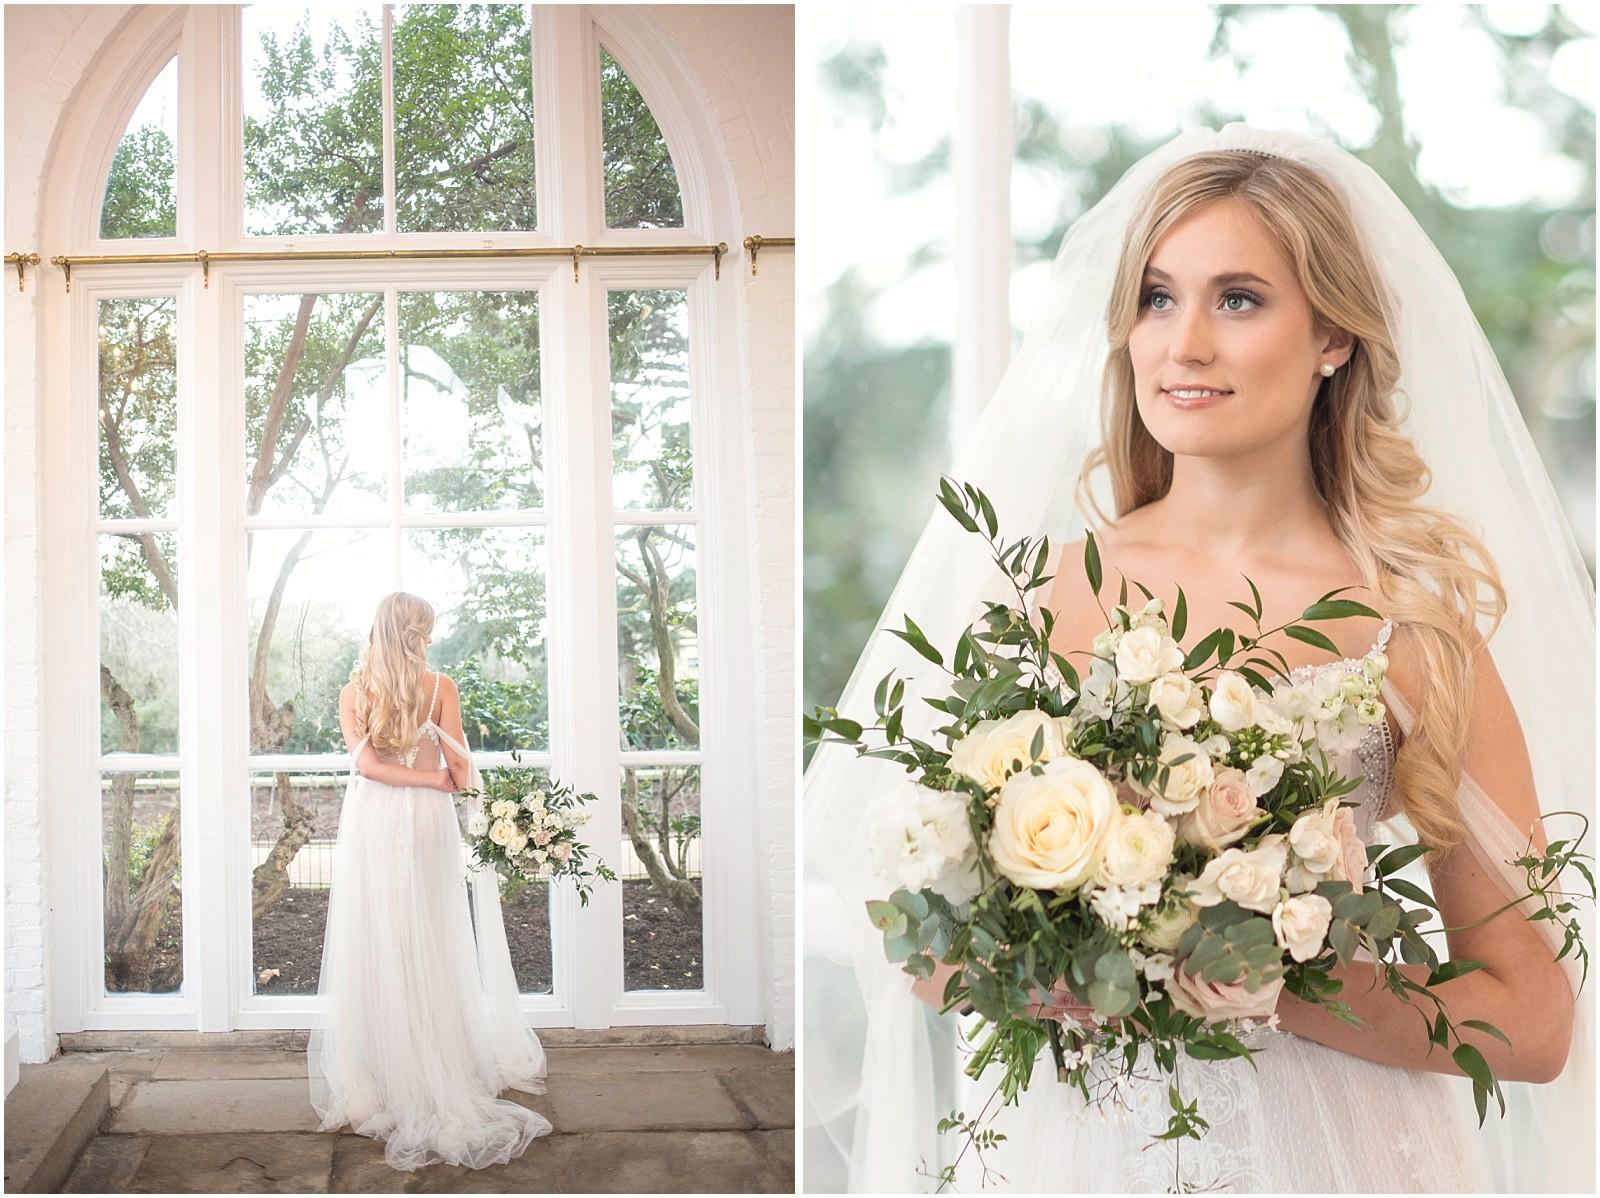 fine art bridal portrait wedding photographer London